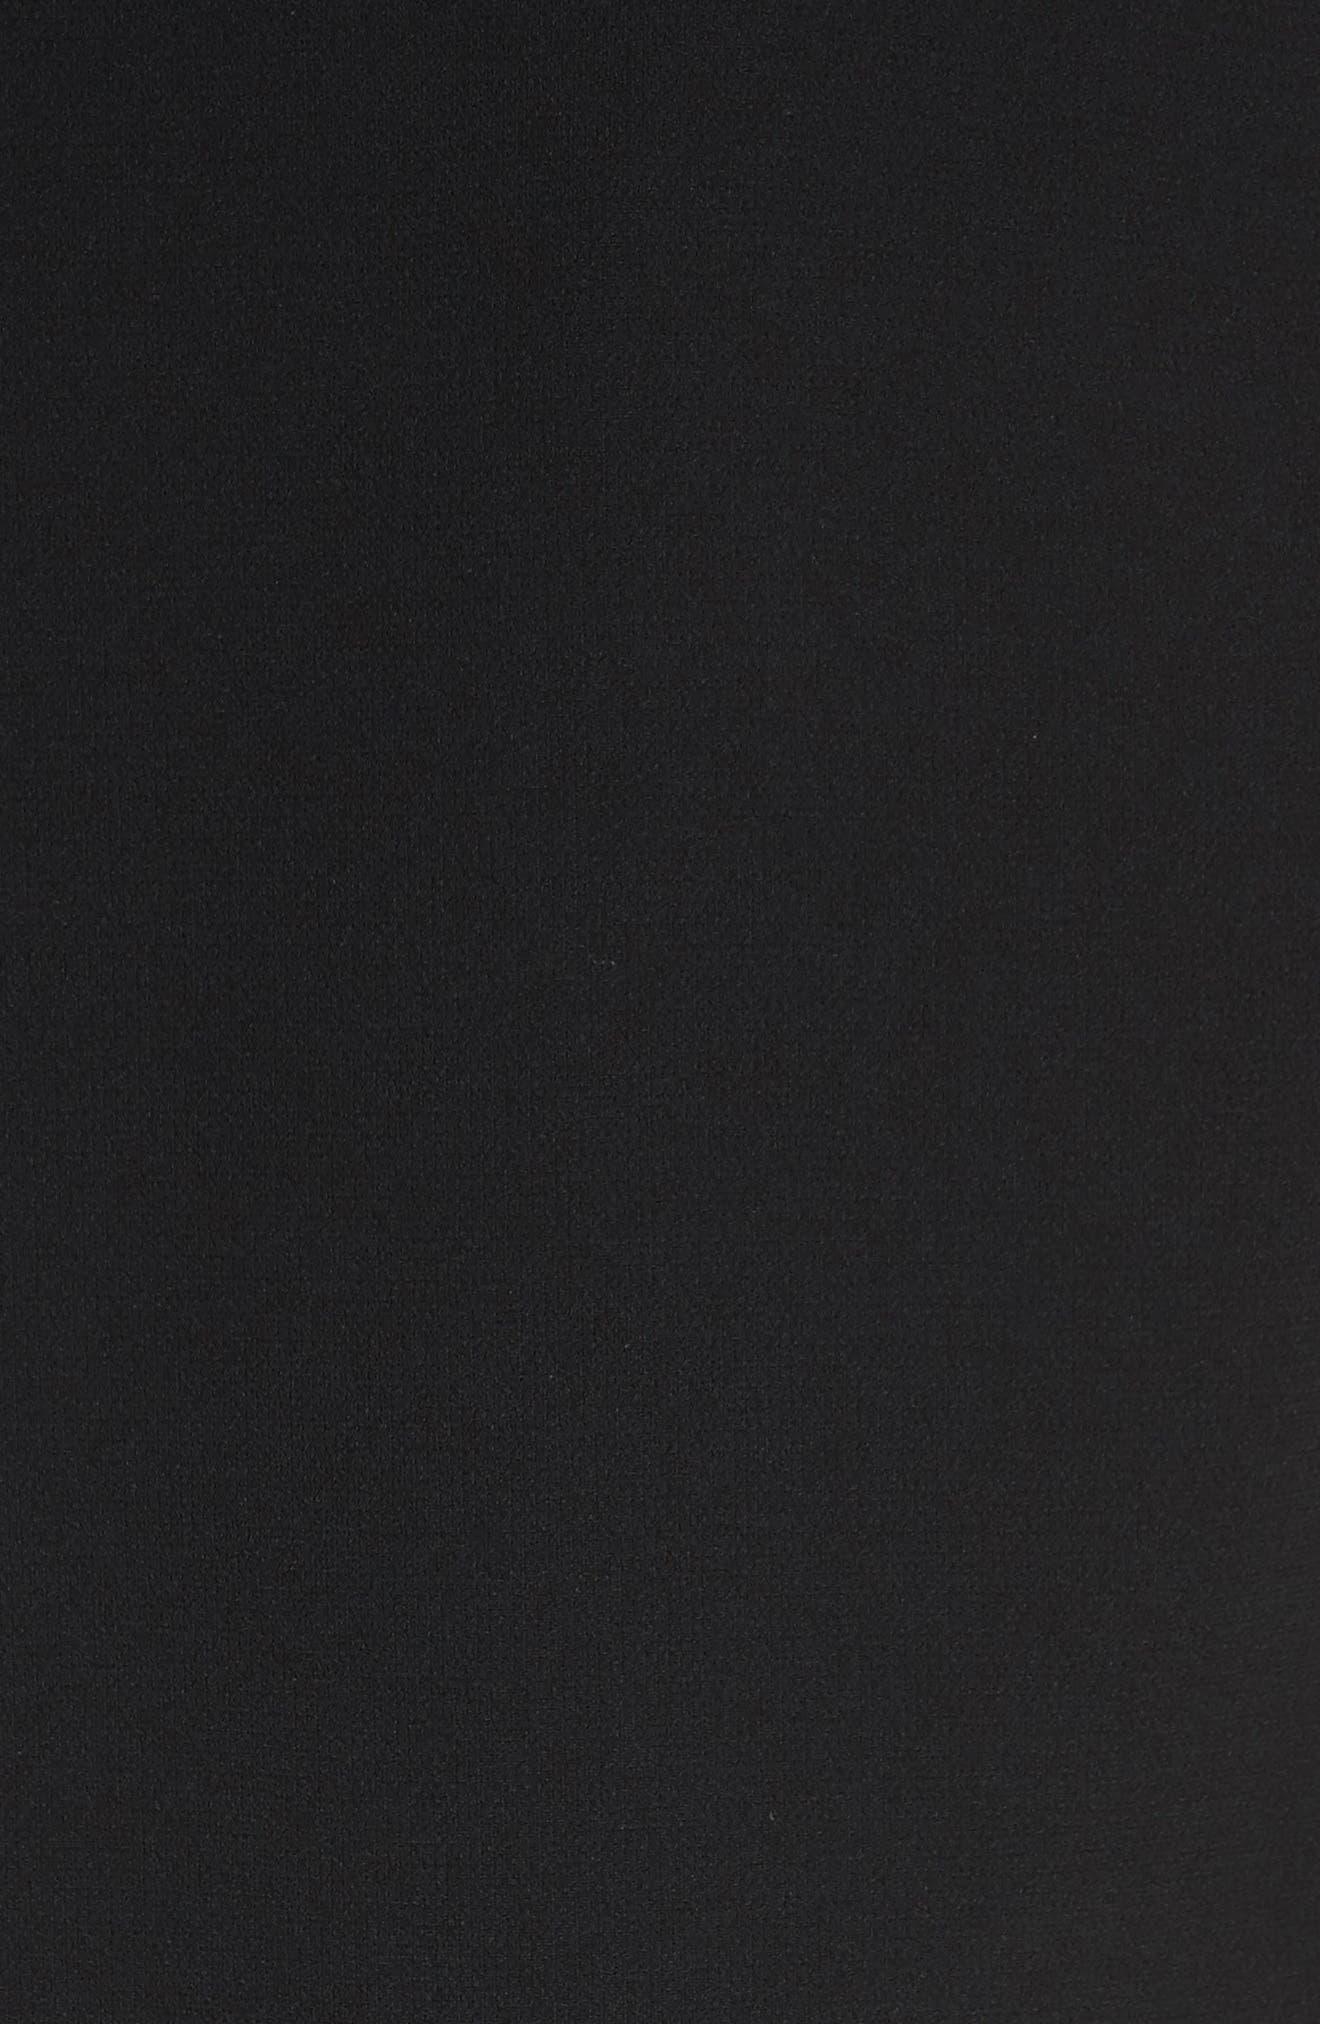 Sospiro Cape Shift Dress,                             Alternate thumbnail 6, color,                             Black